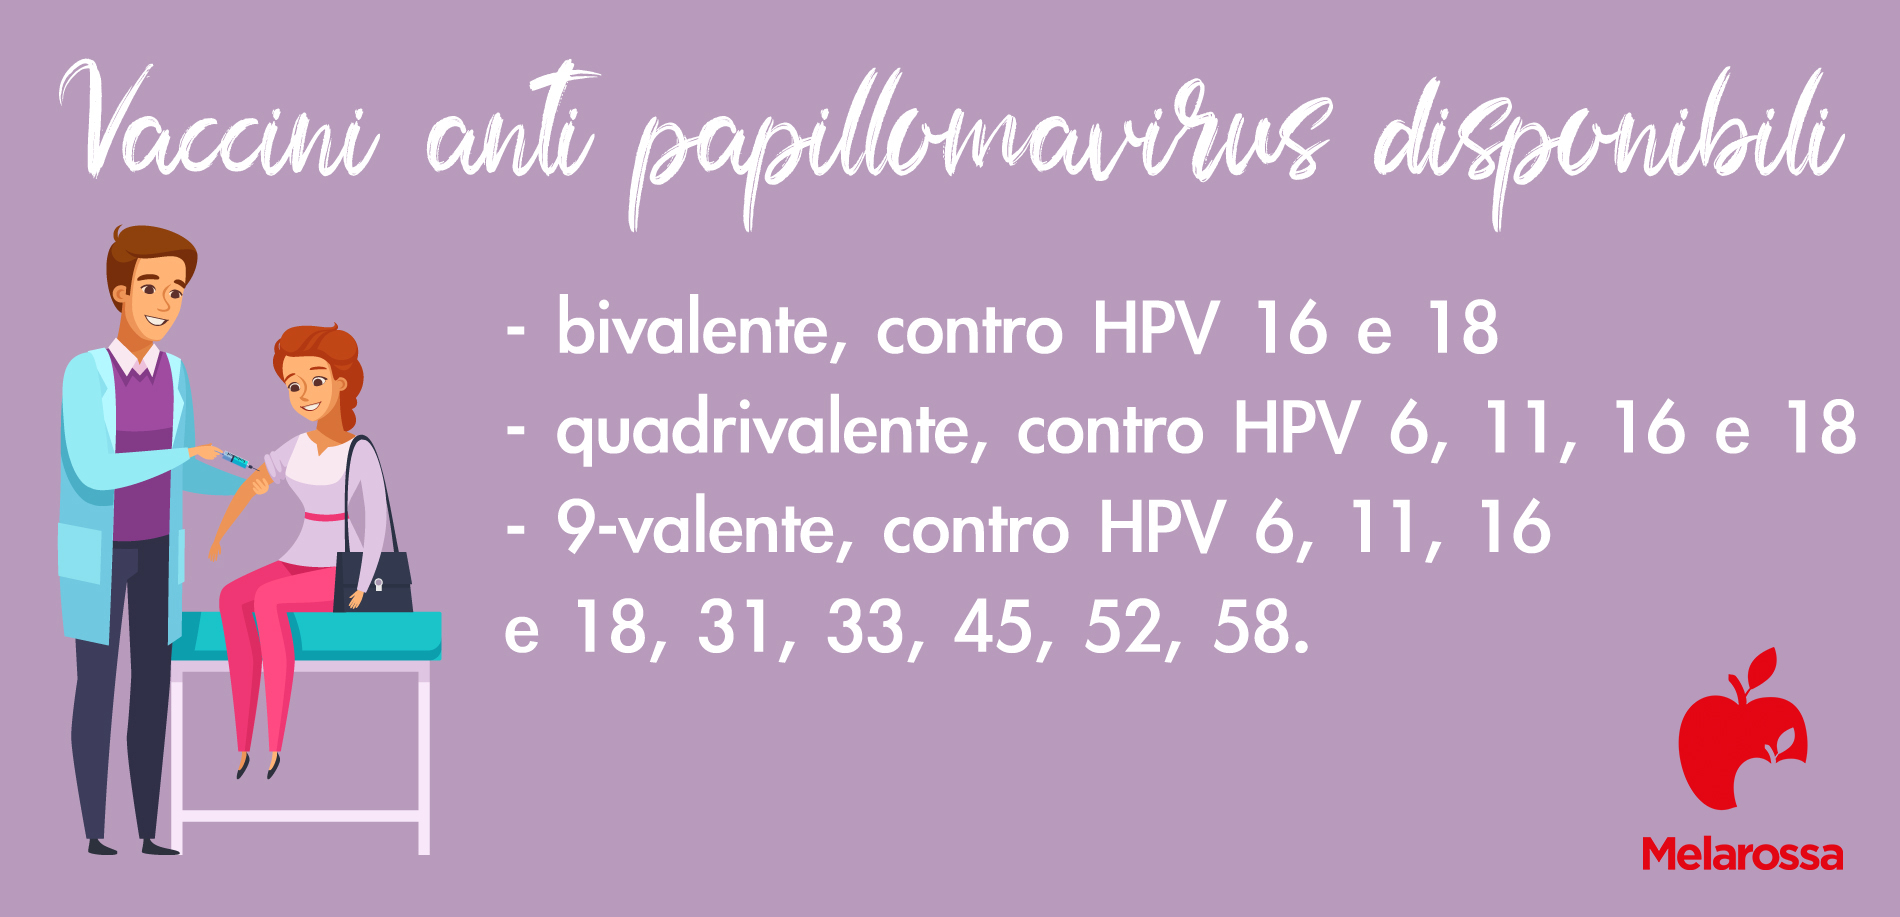 MST, papilloma virus vaccini